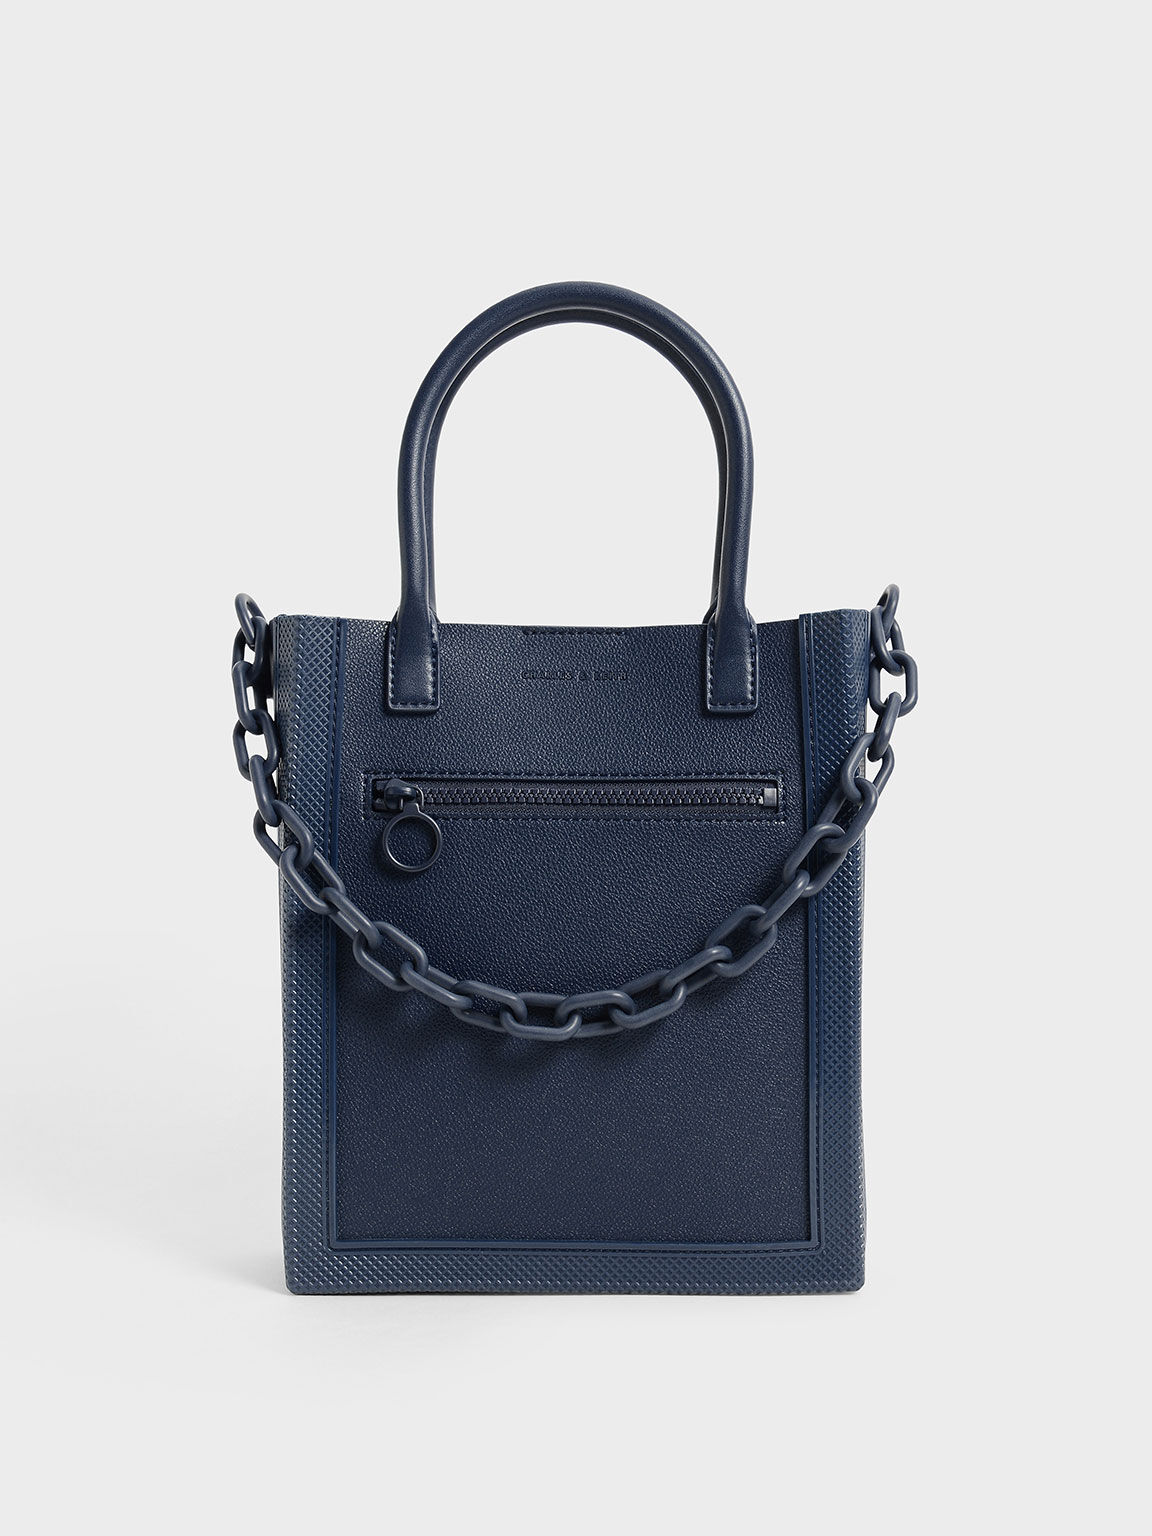 Chain Link Tote Bag, Navy, hi-res